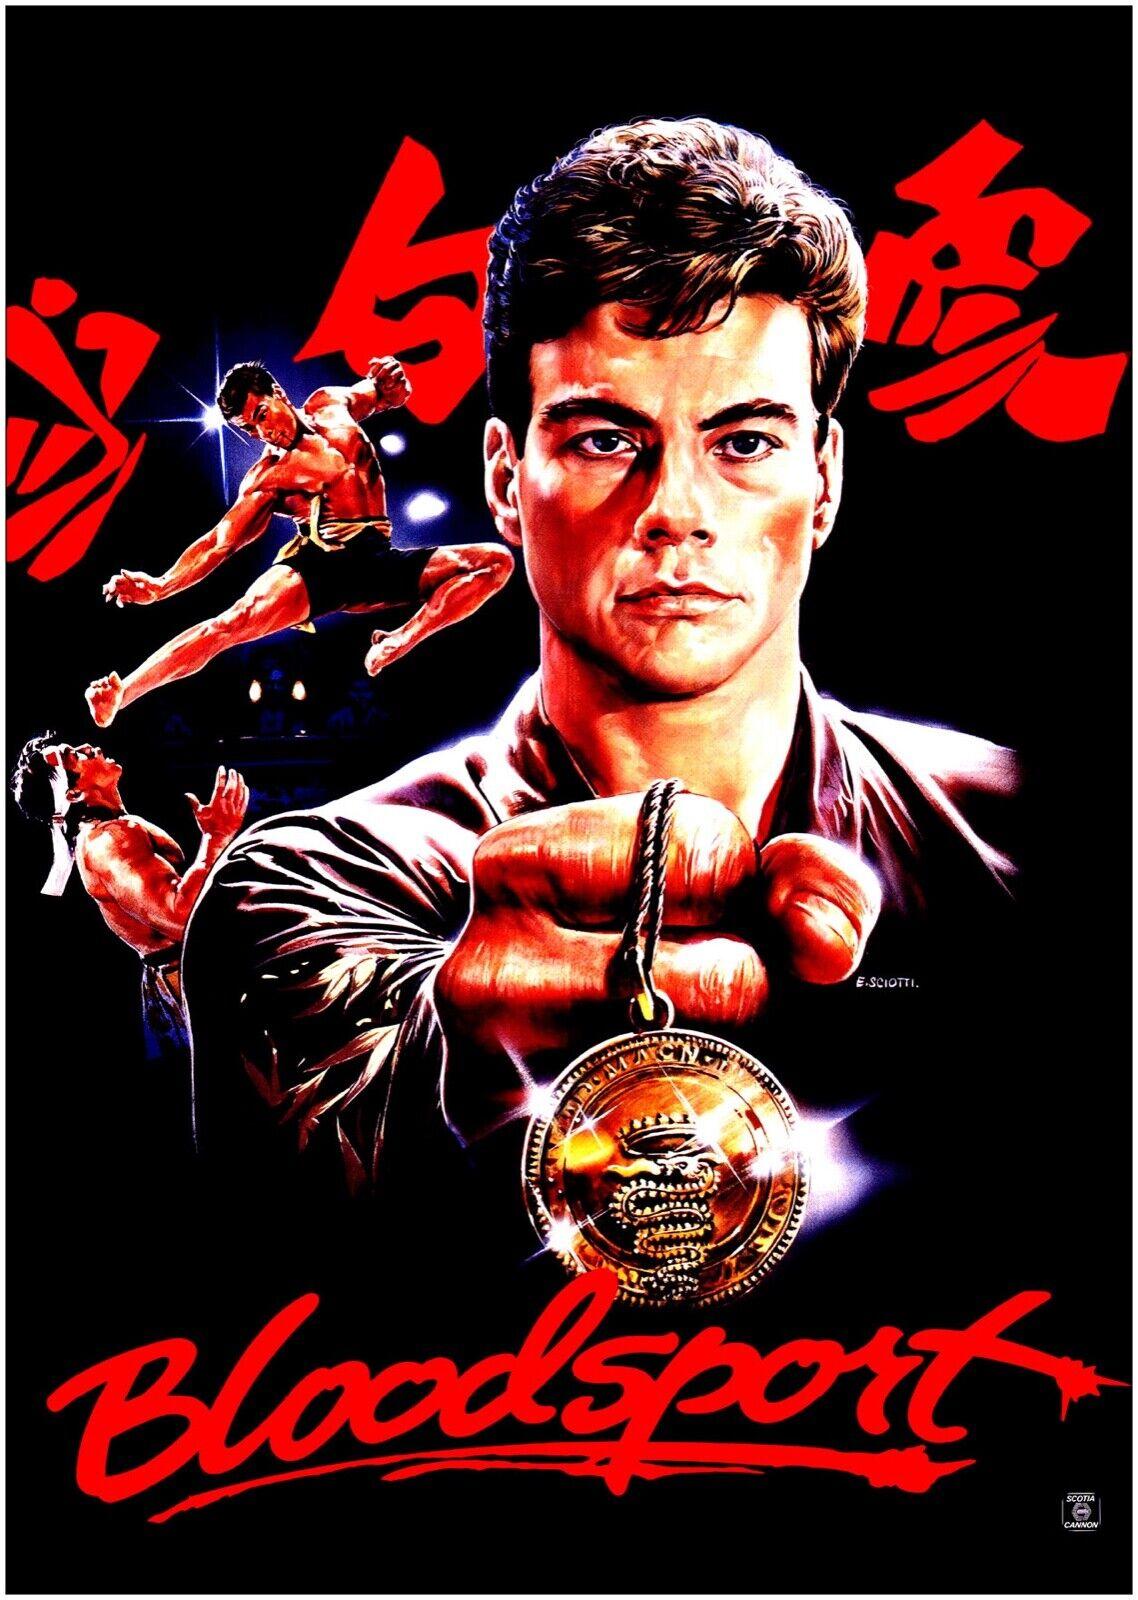 Bloodsport Van Damme Classic Movie Large CANVAS Art Print A0 A1 A2 A3 A4